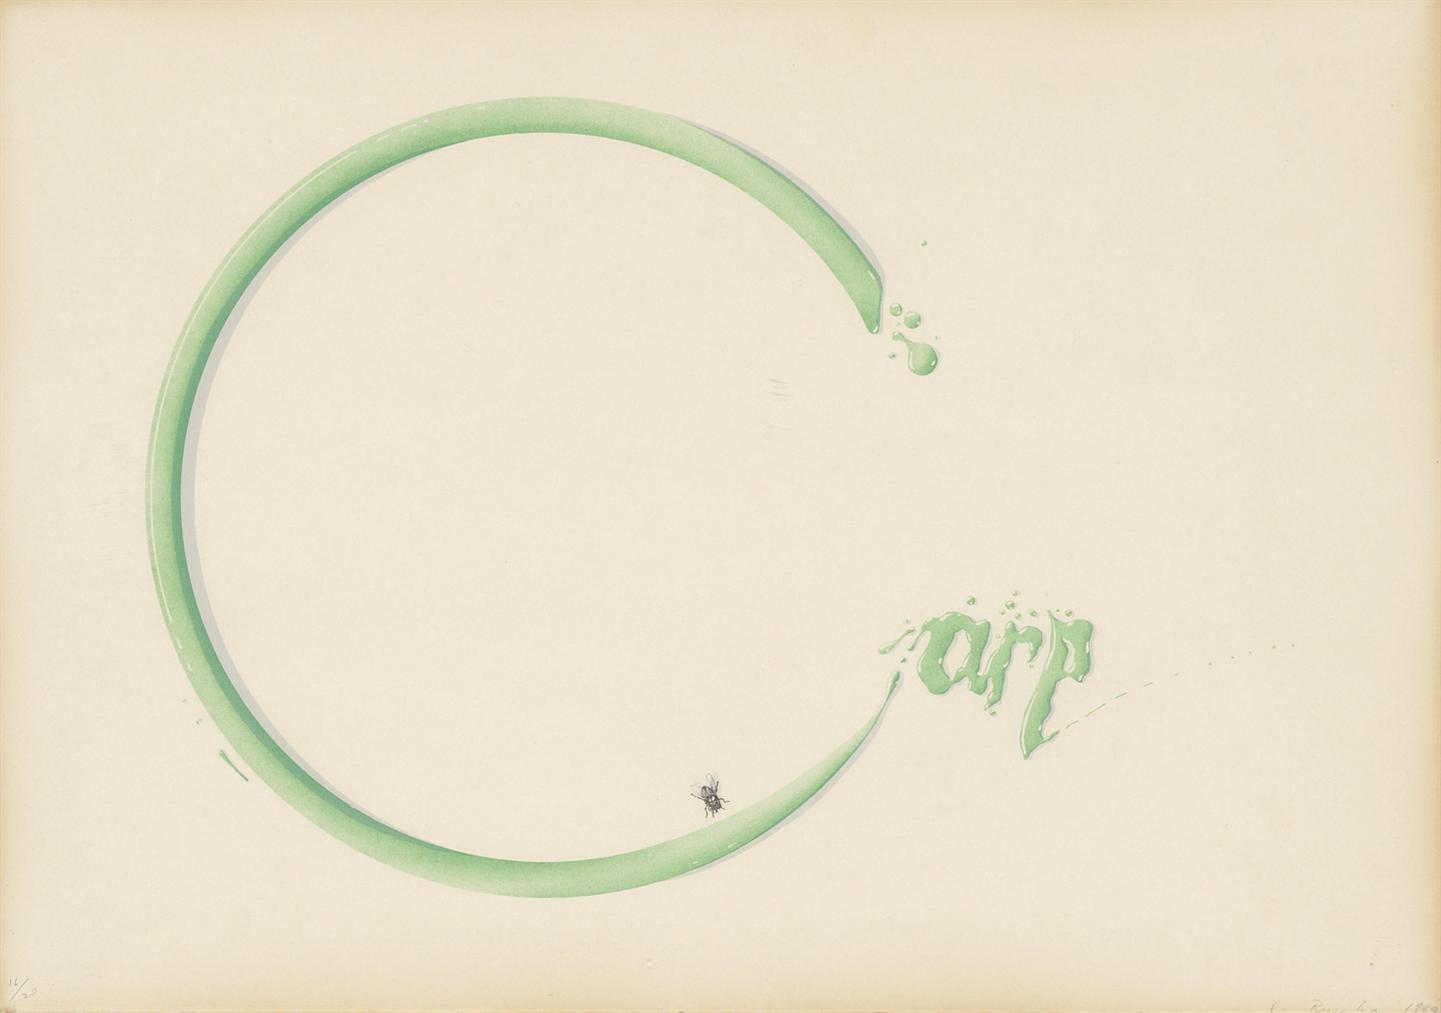 Ed Ruscha-Carp With Fly-1969